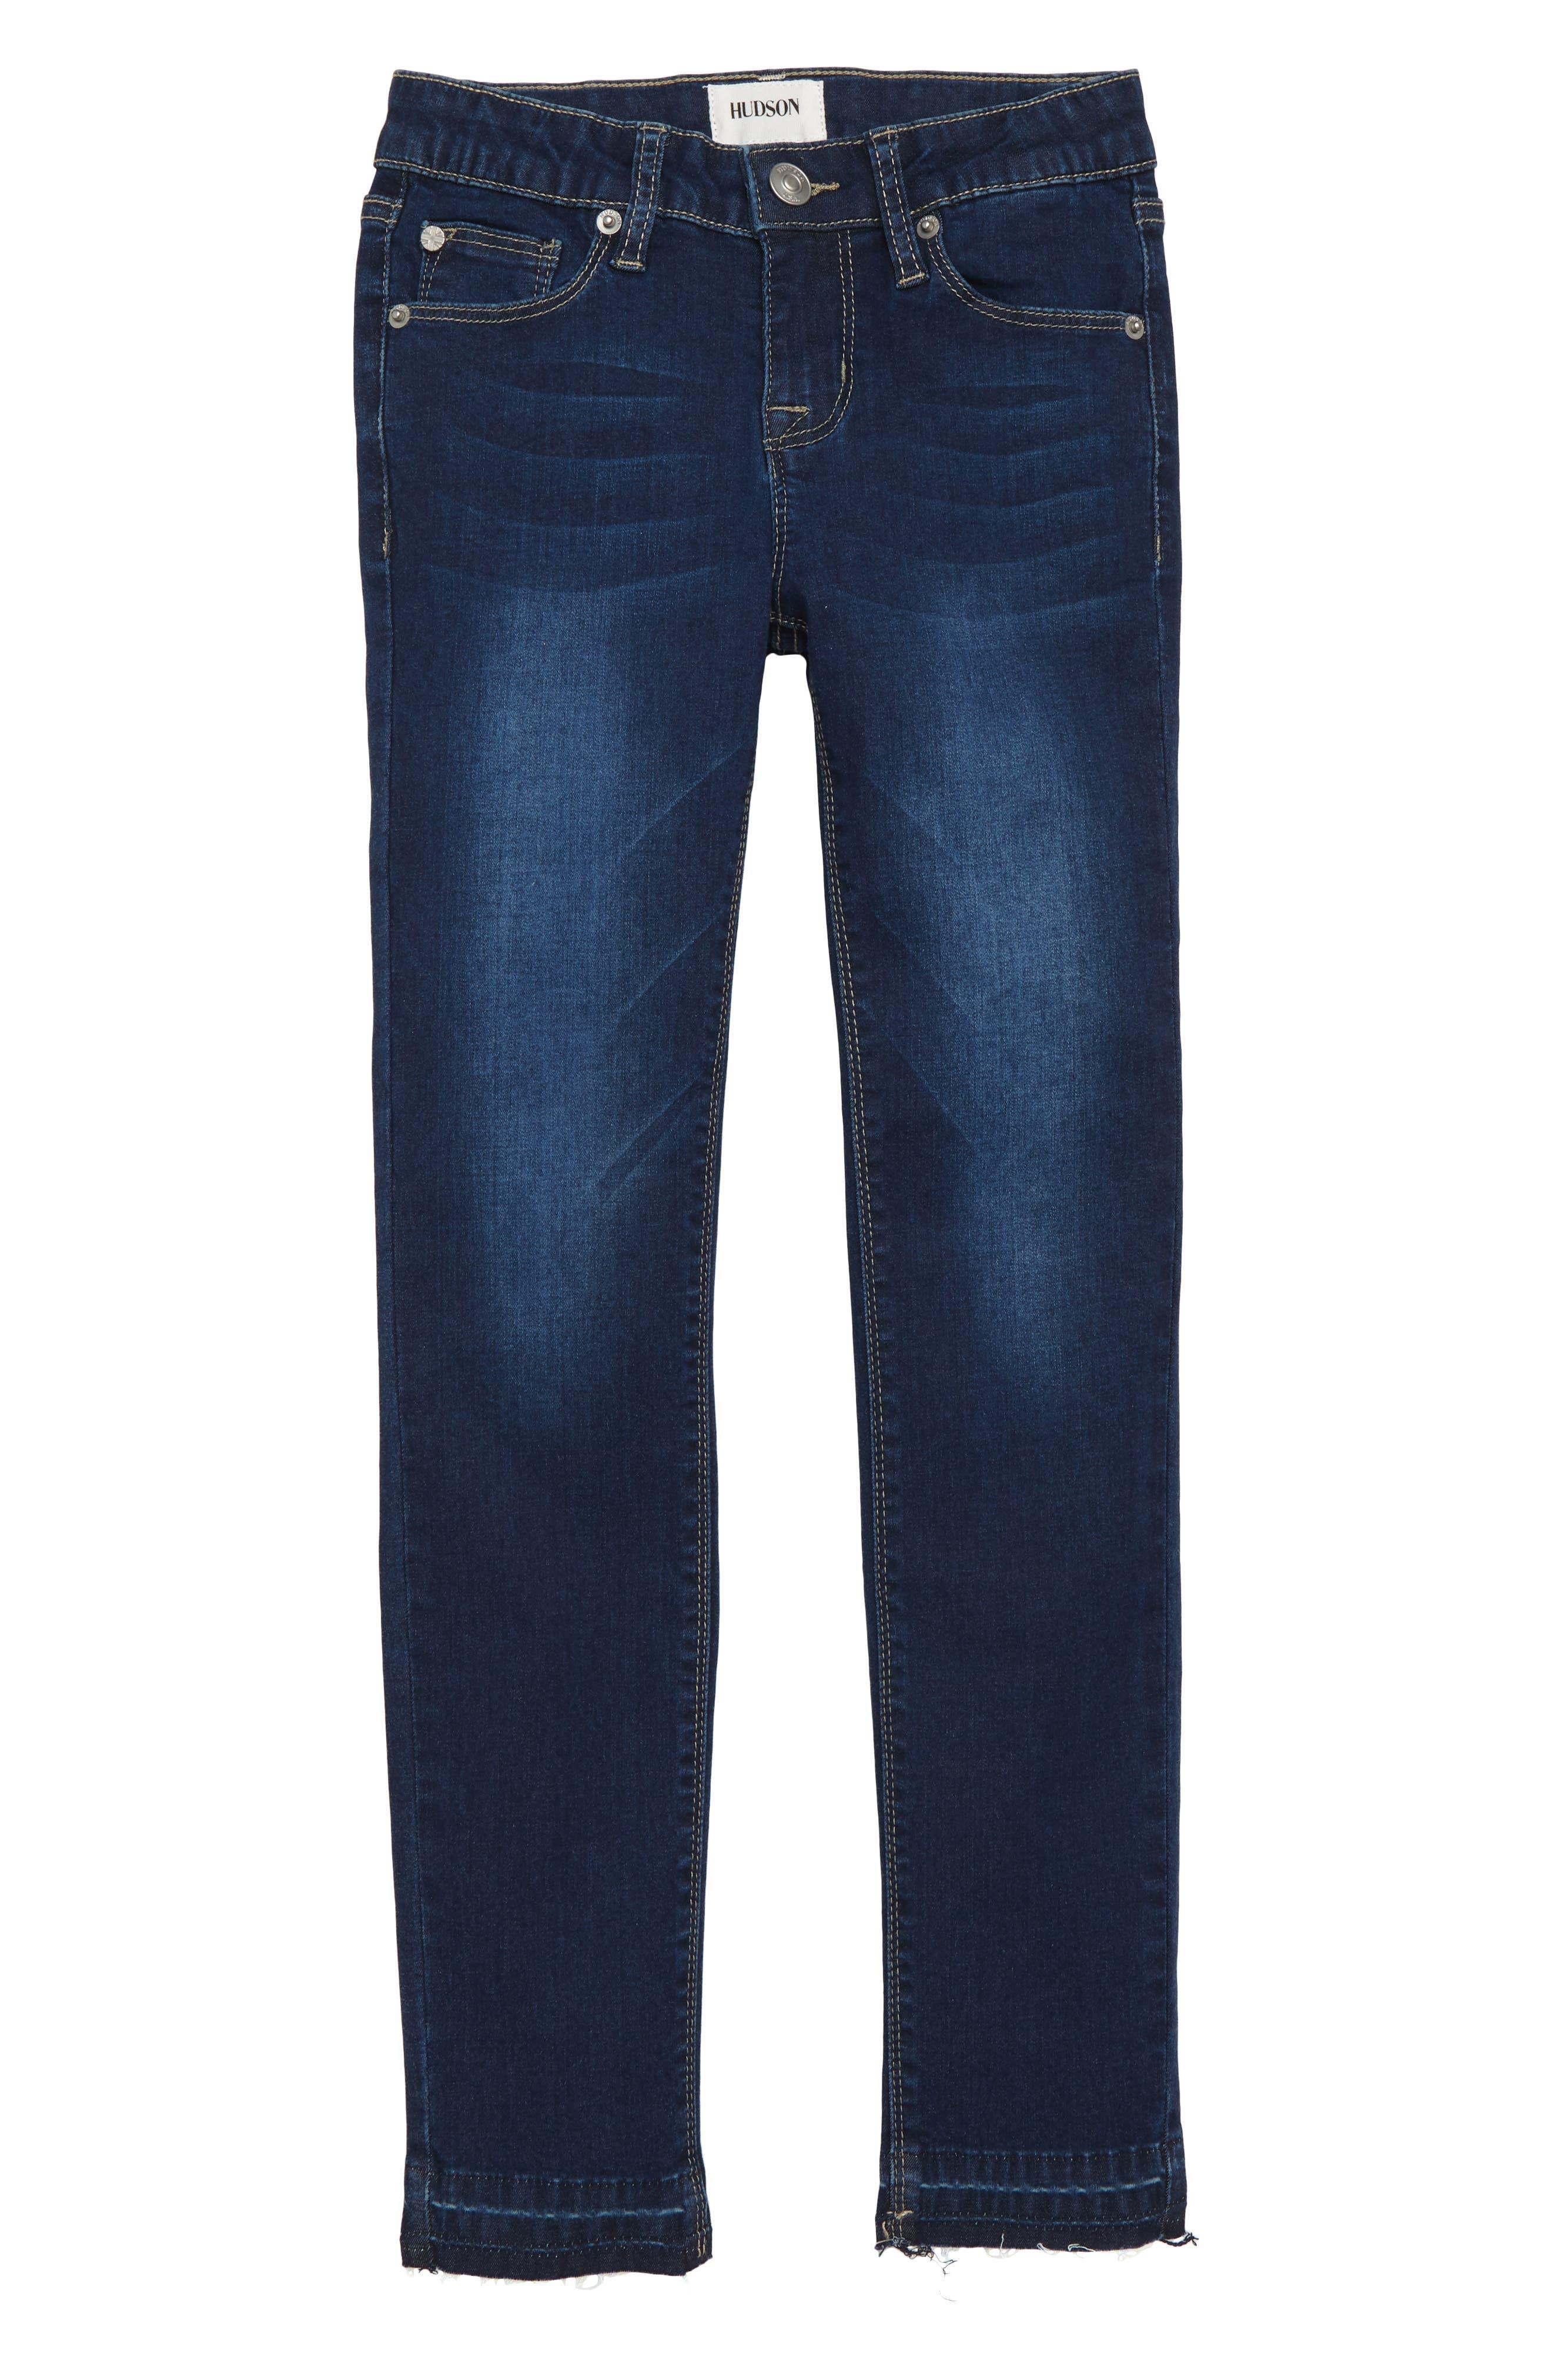 Christa Release Hem Skinny Jeans,                         Main,                         color, GLEAM WASH